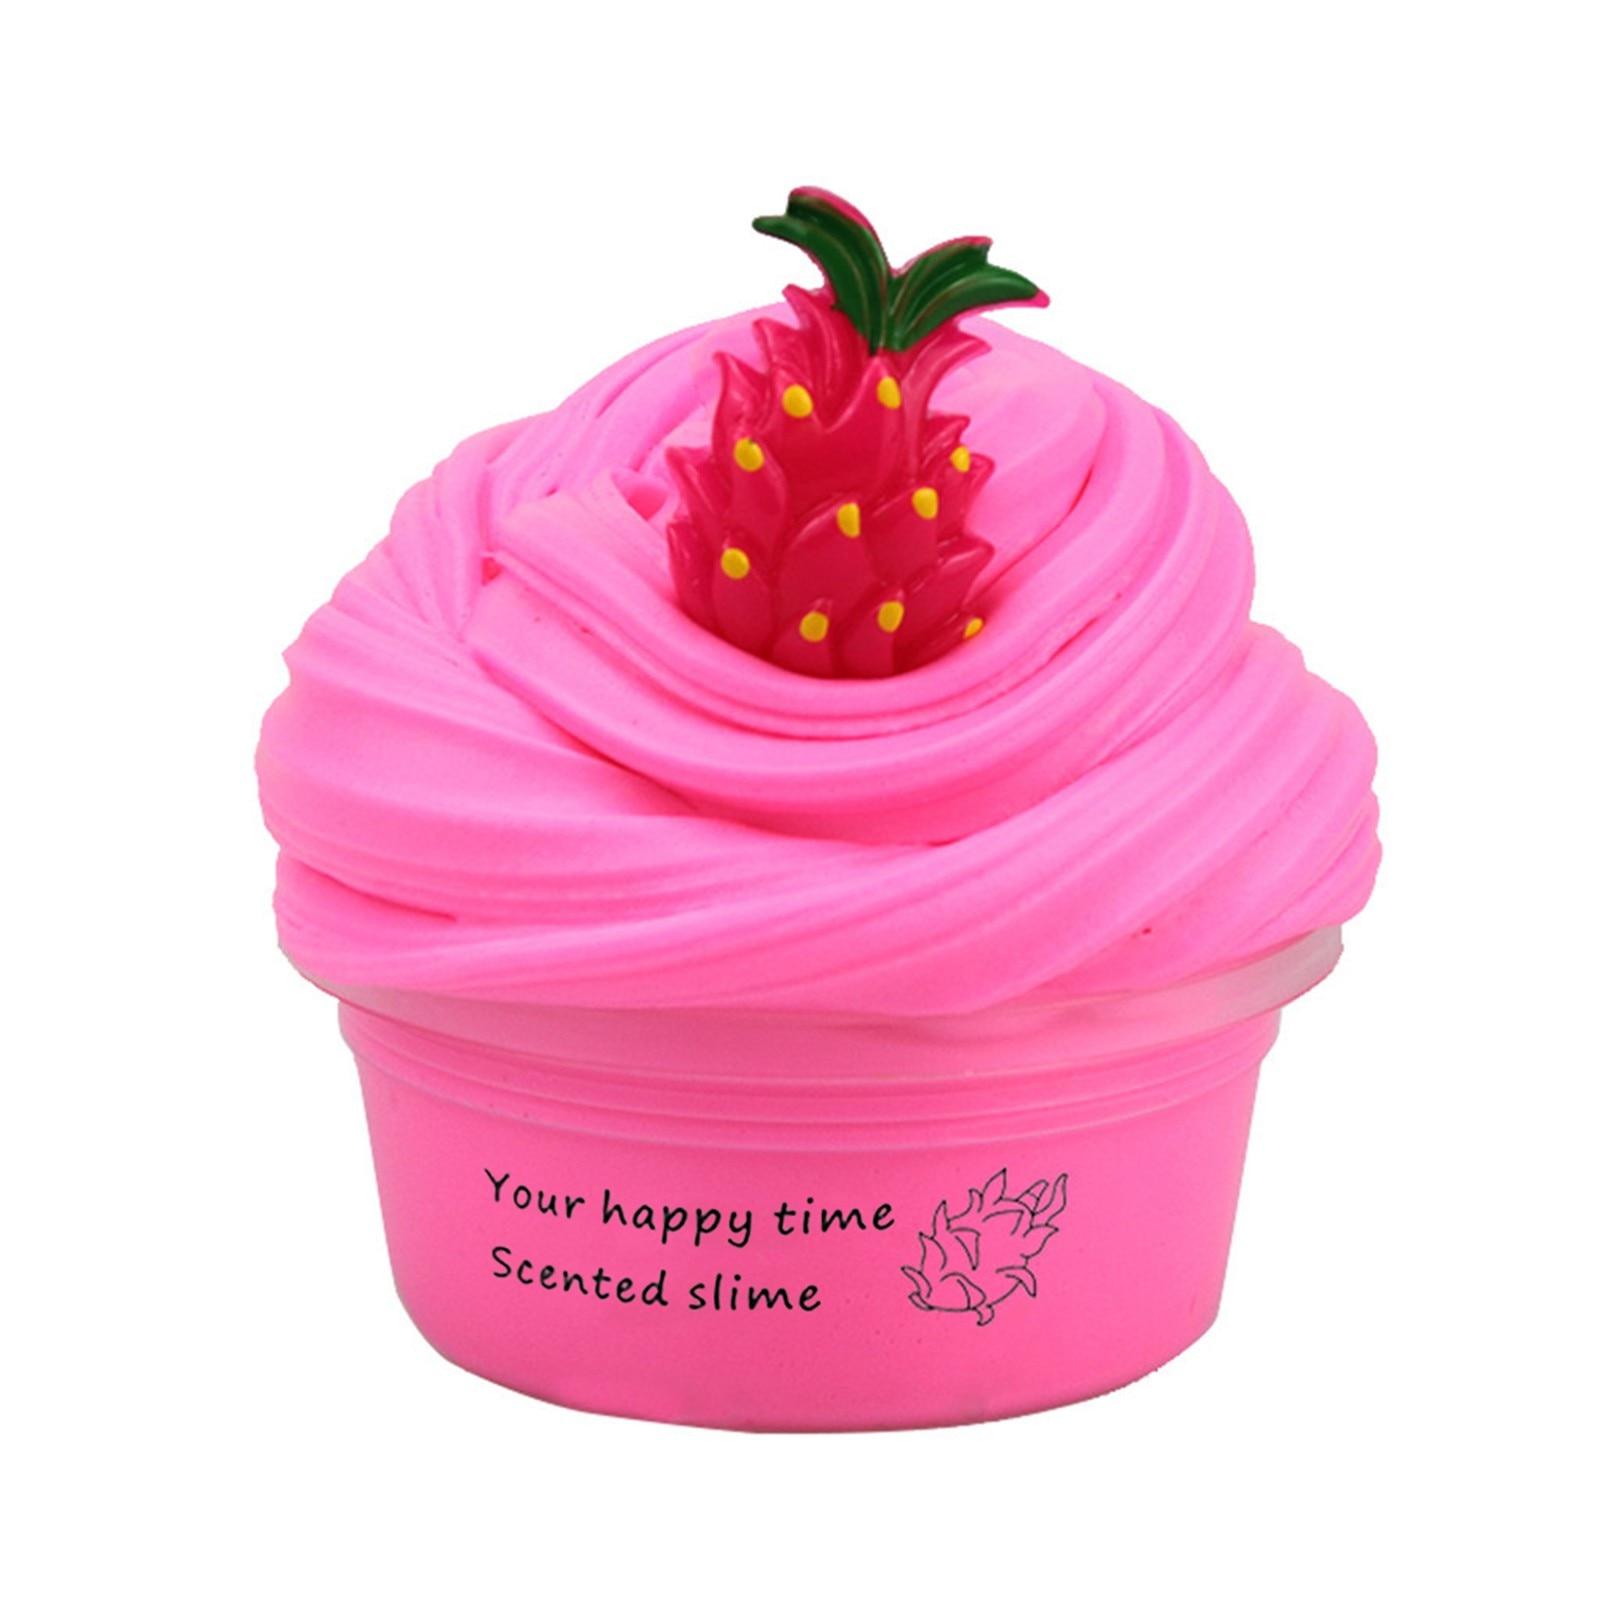 Toys Stress Fidget-Toy Slime Aromatherapy-Pressure Sensory-Anxiety Children Diy Cloud img3